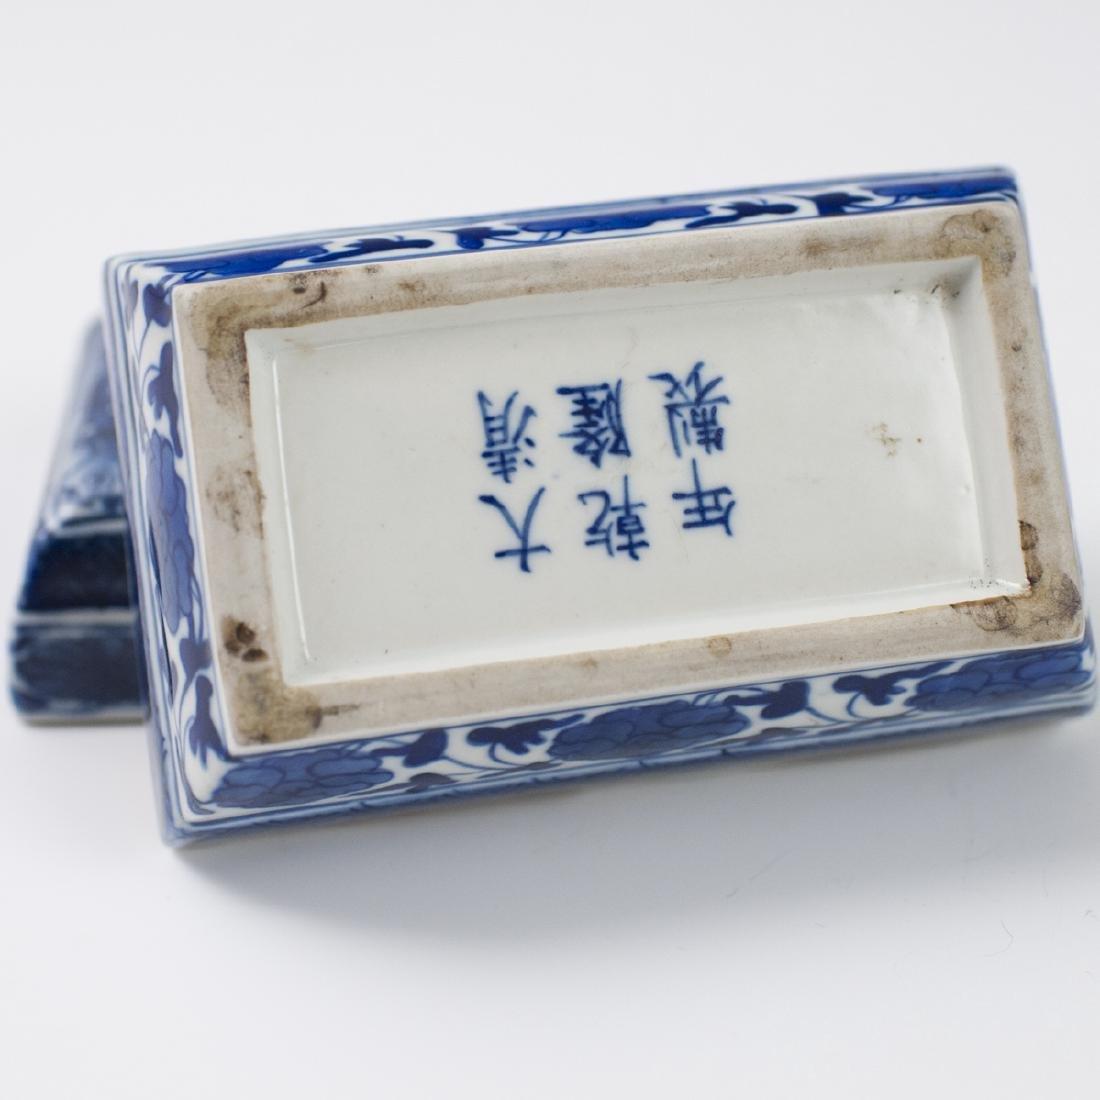 Antique Chinese Porcelain Box - 3